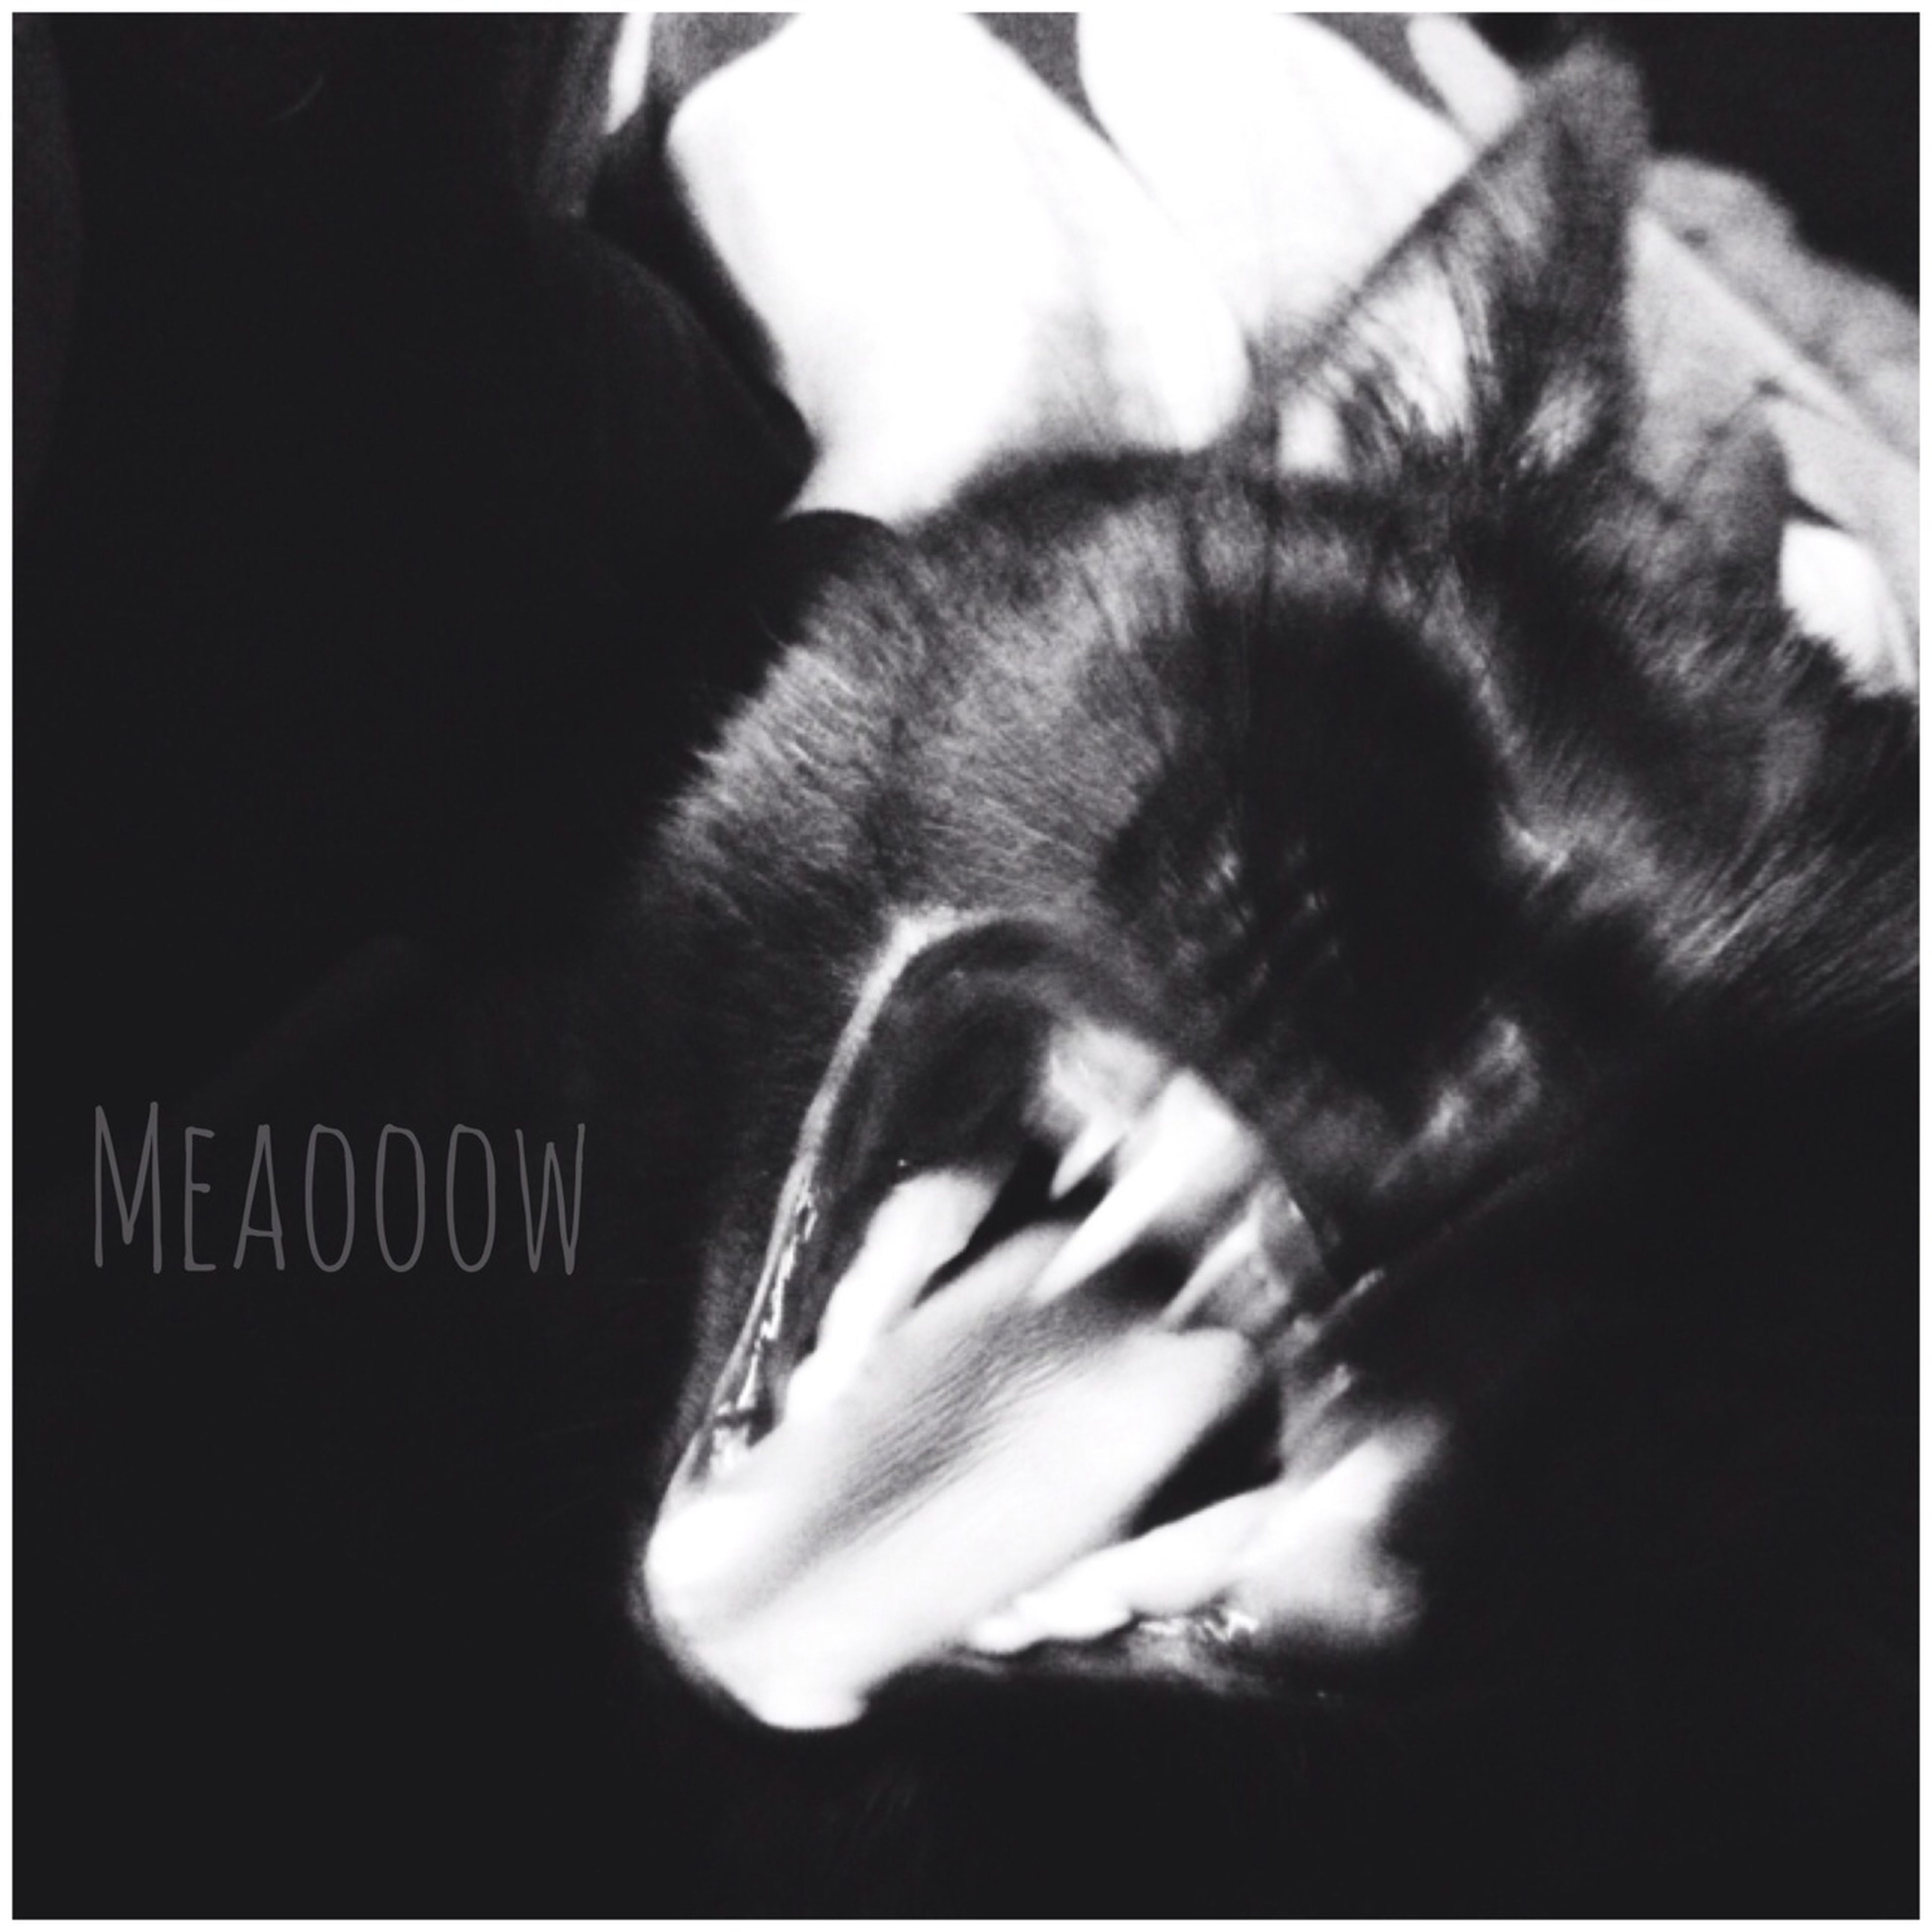 Meaoooow